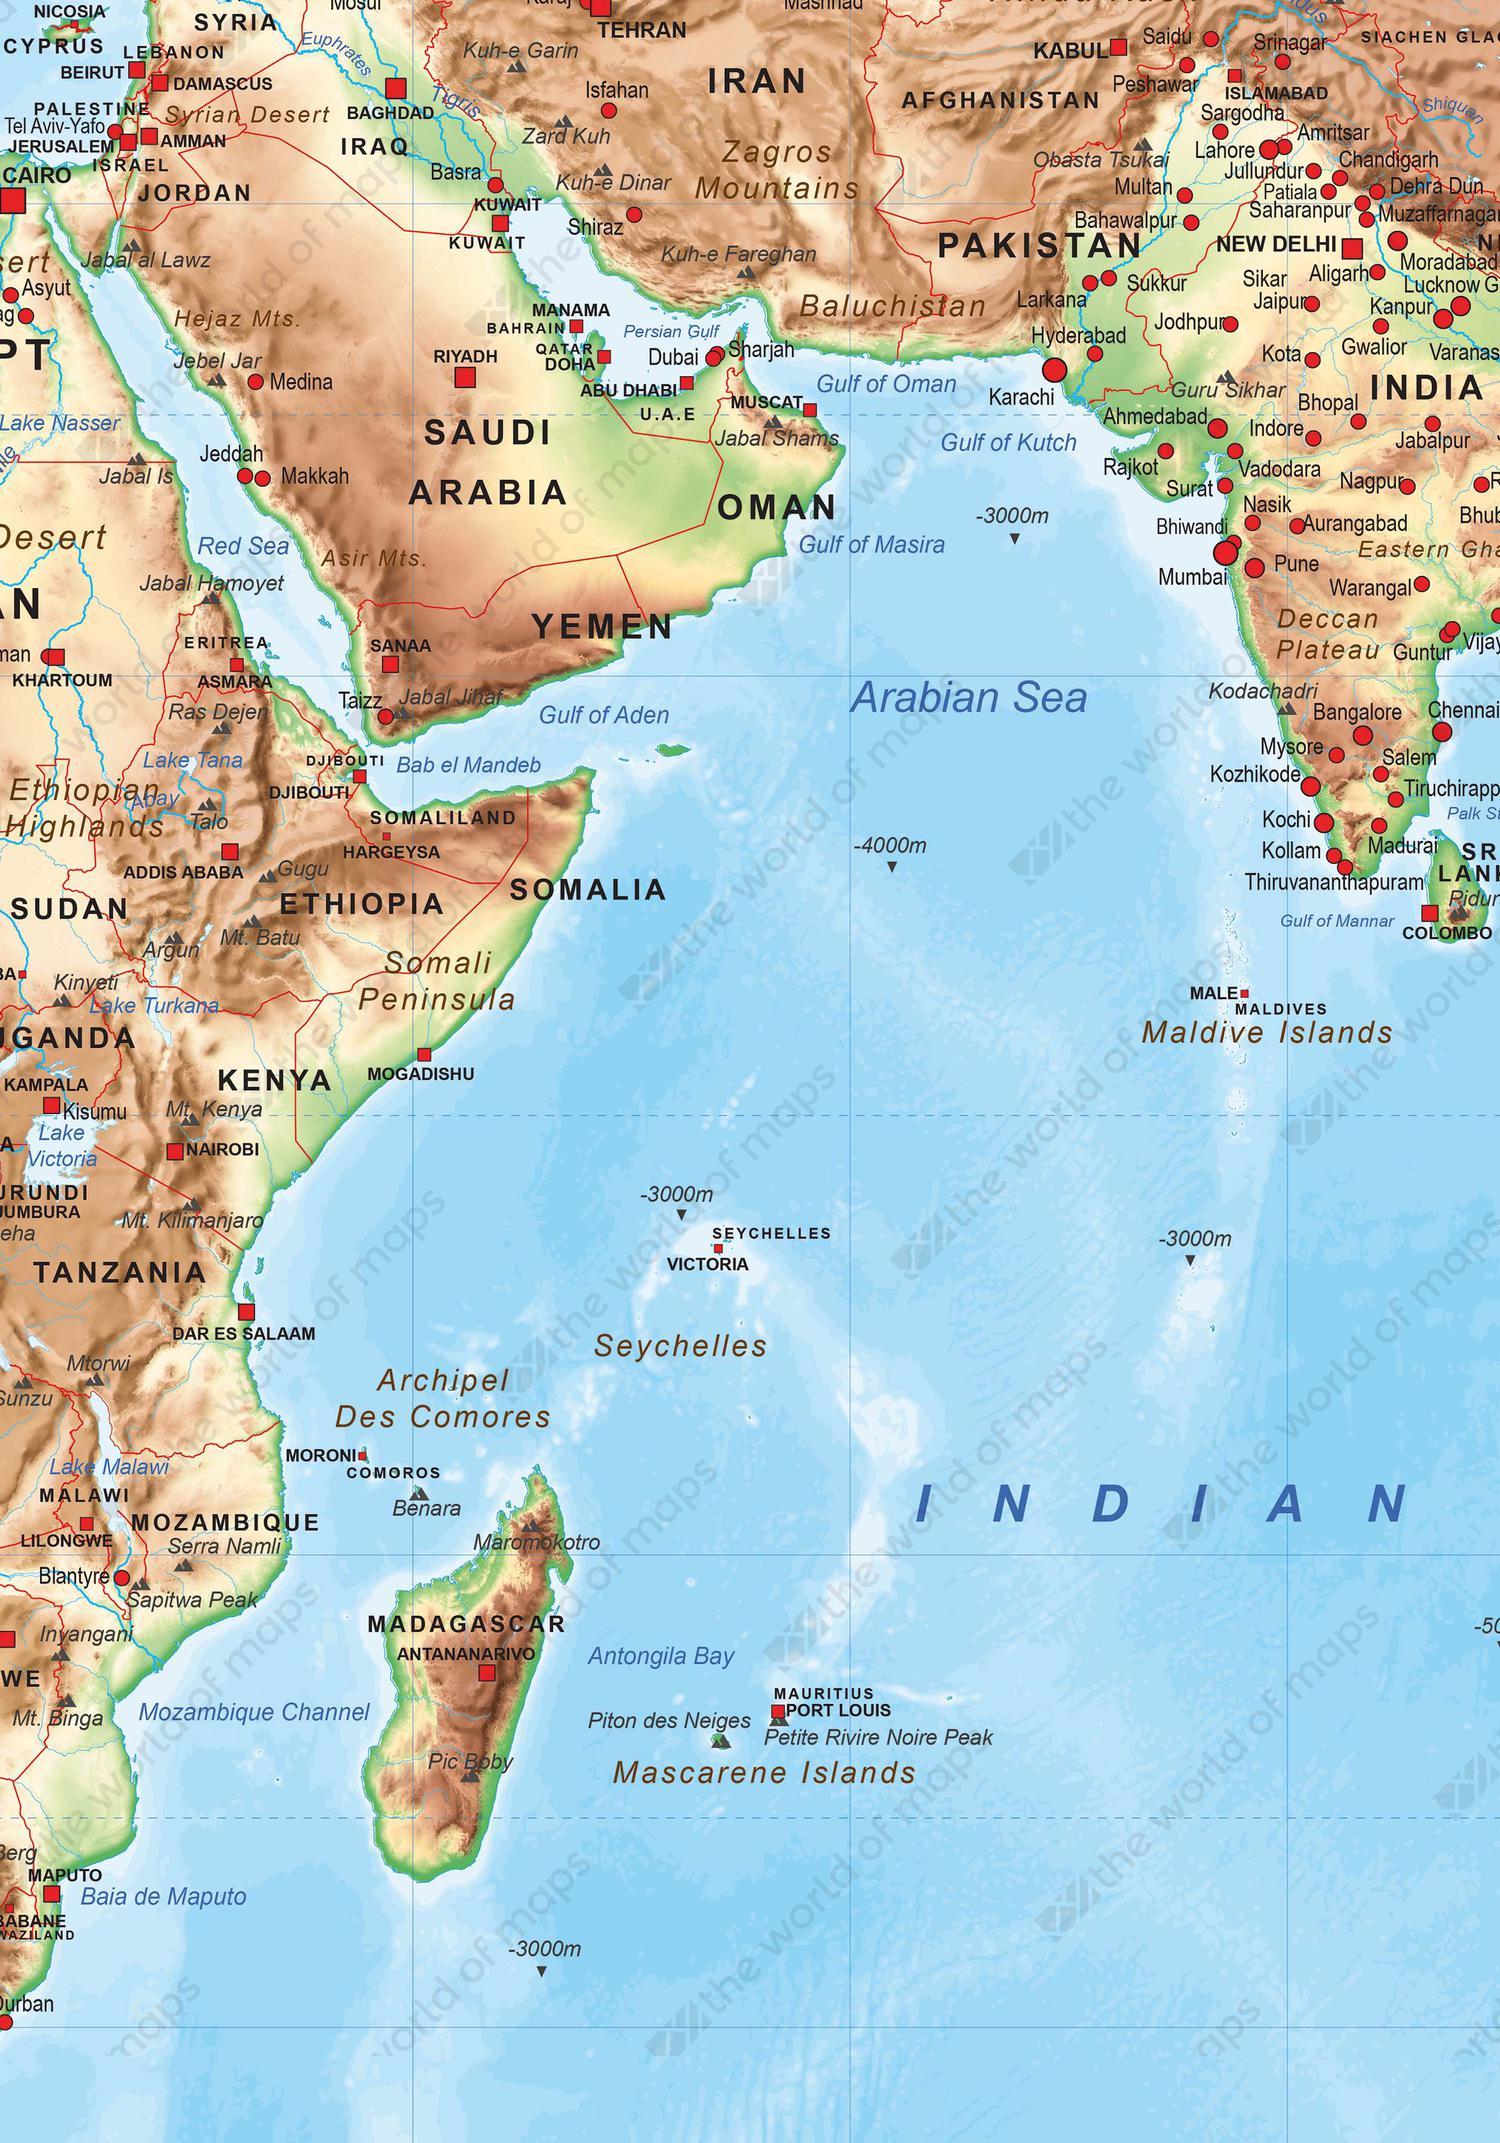 Digital physical map of The World medium 1502 The World of Mapscom